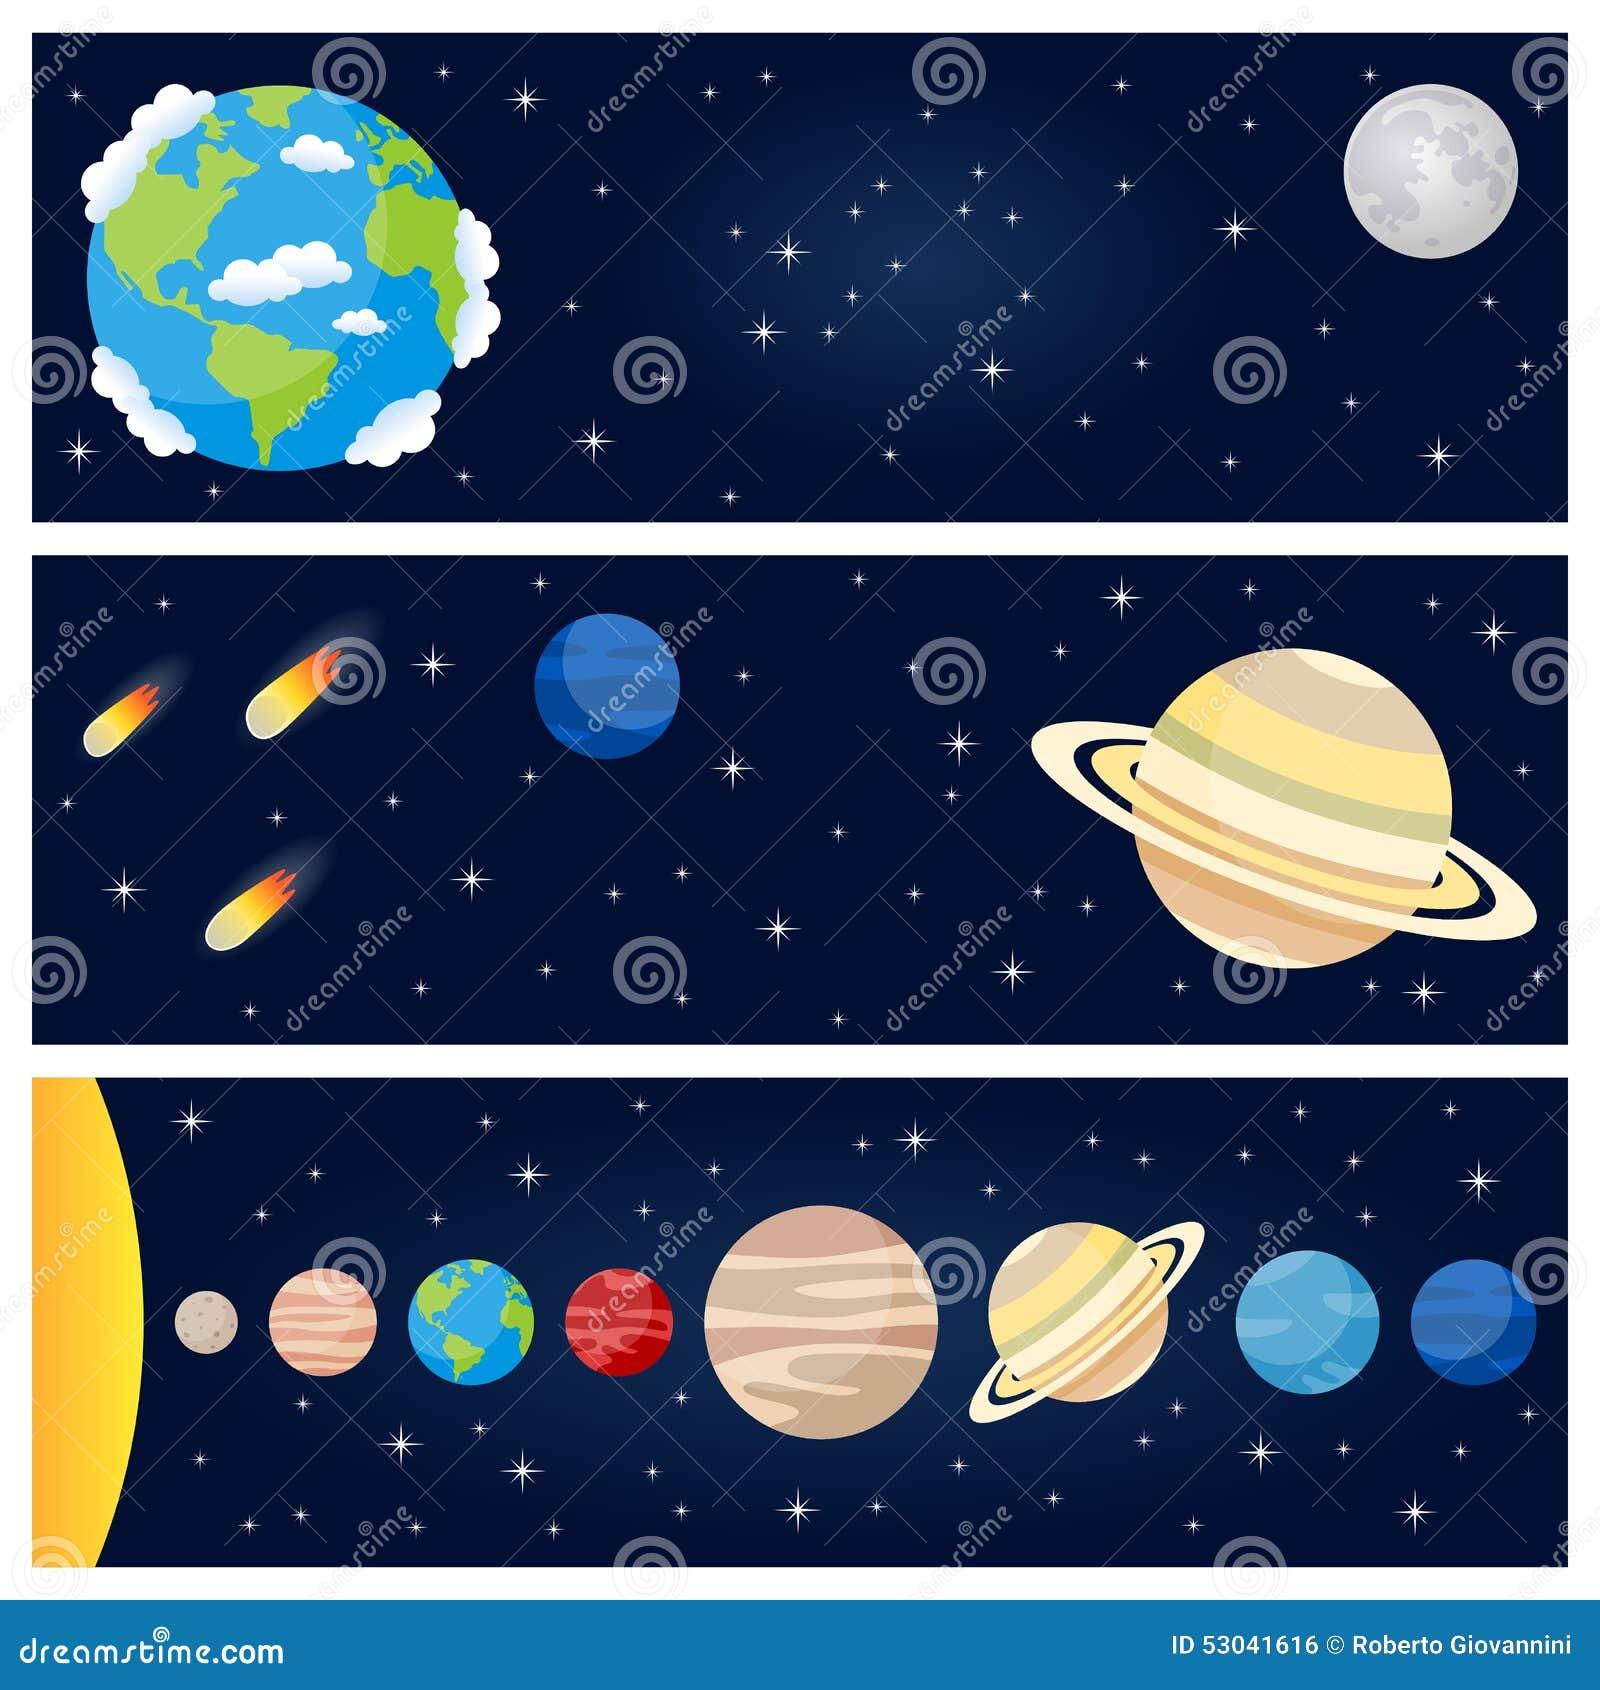 mars planet banner - photo #22